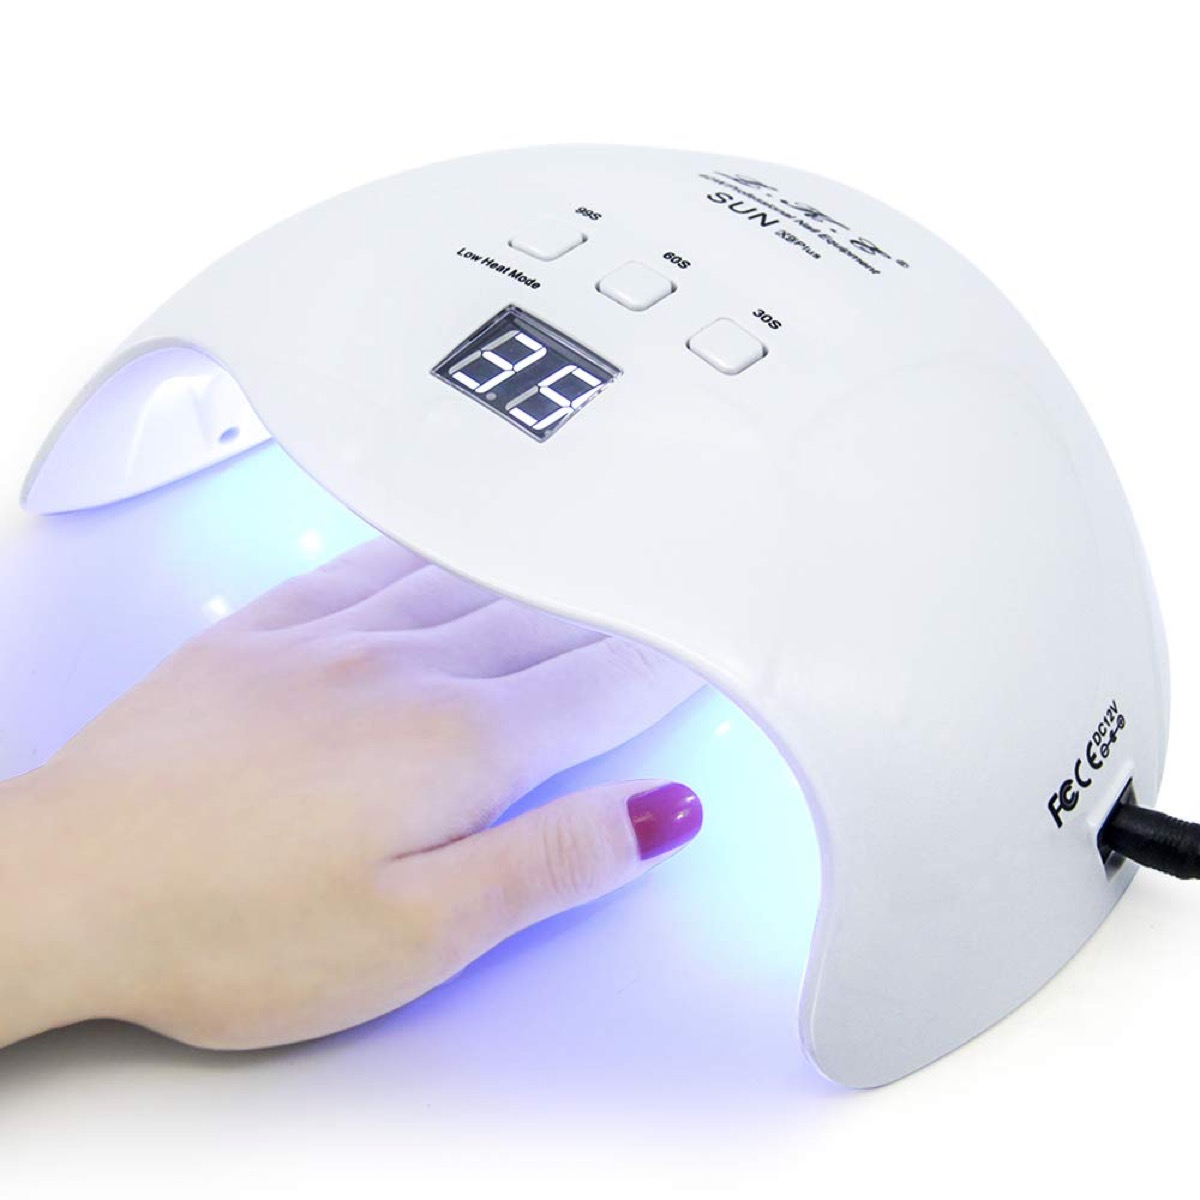 Hand in gel nail dryer